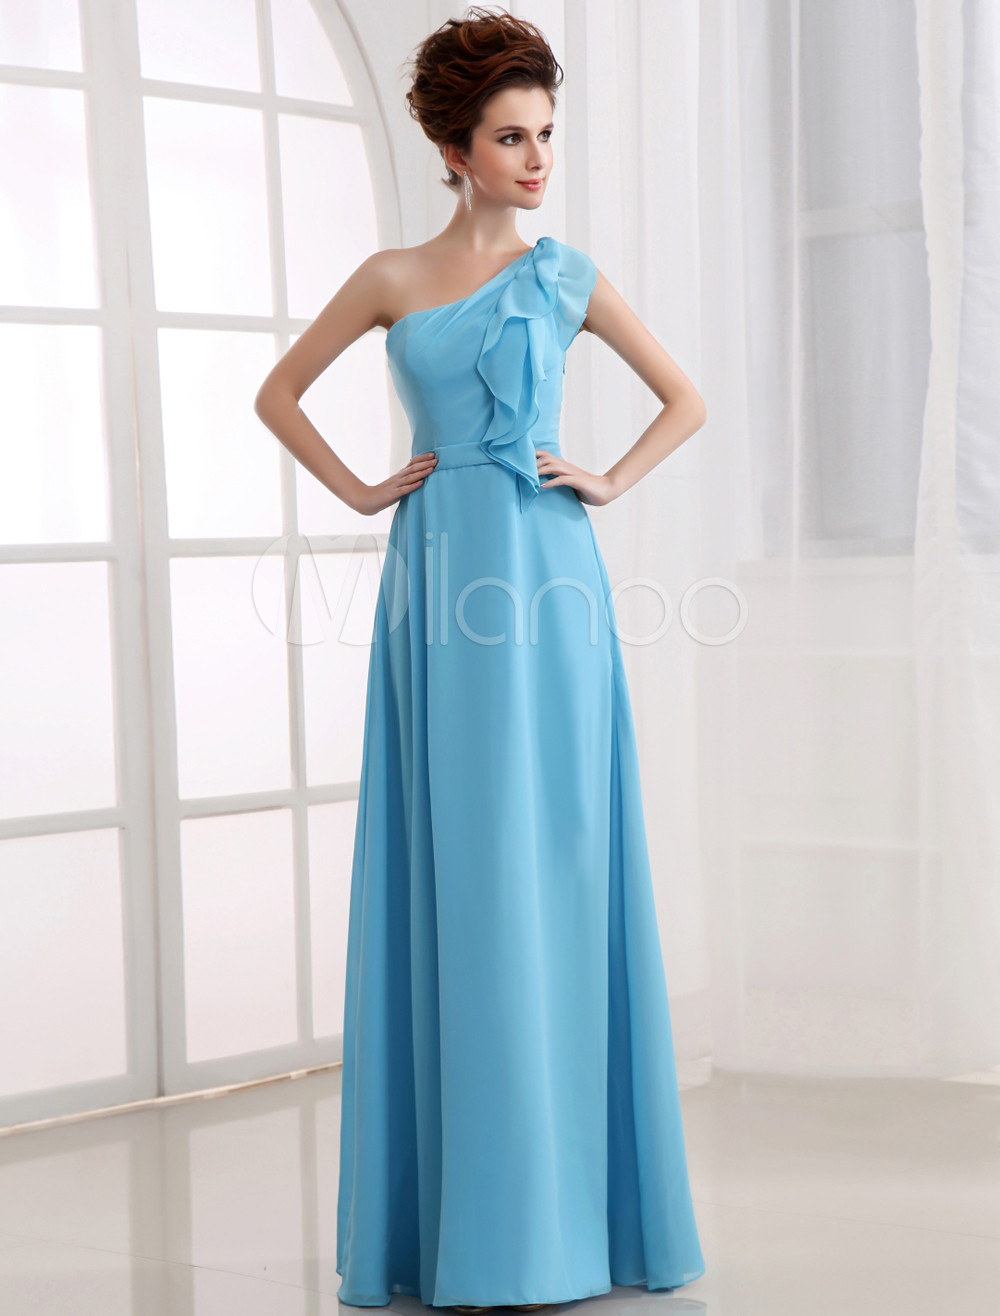 Blue One-shoulder Satin Floor Length Womens Bridesmaid Dress